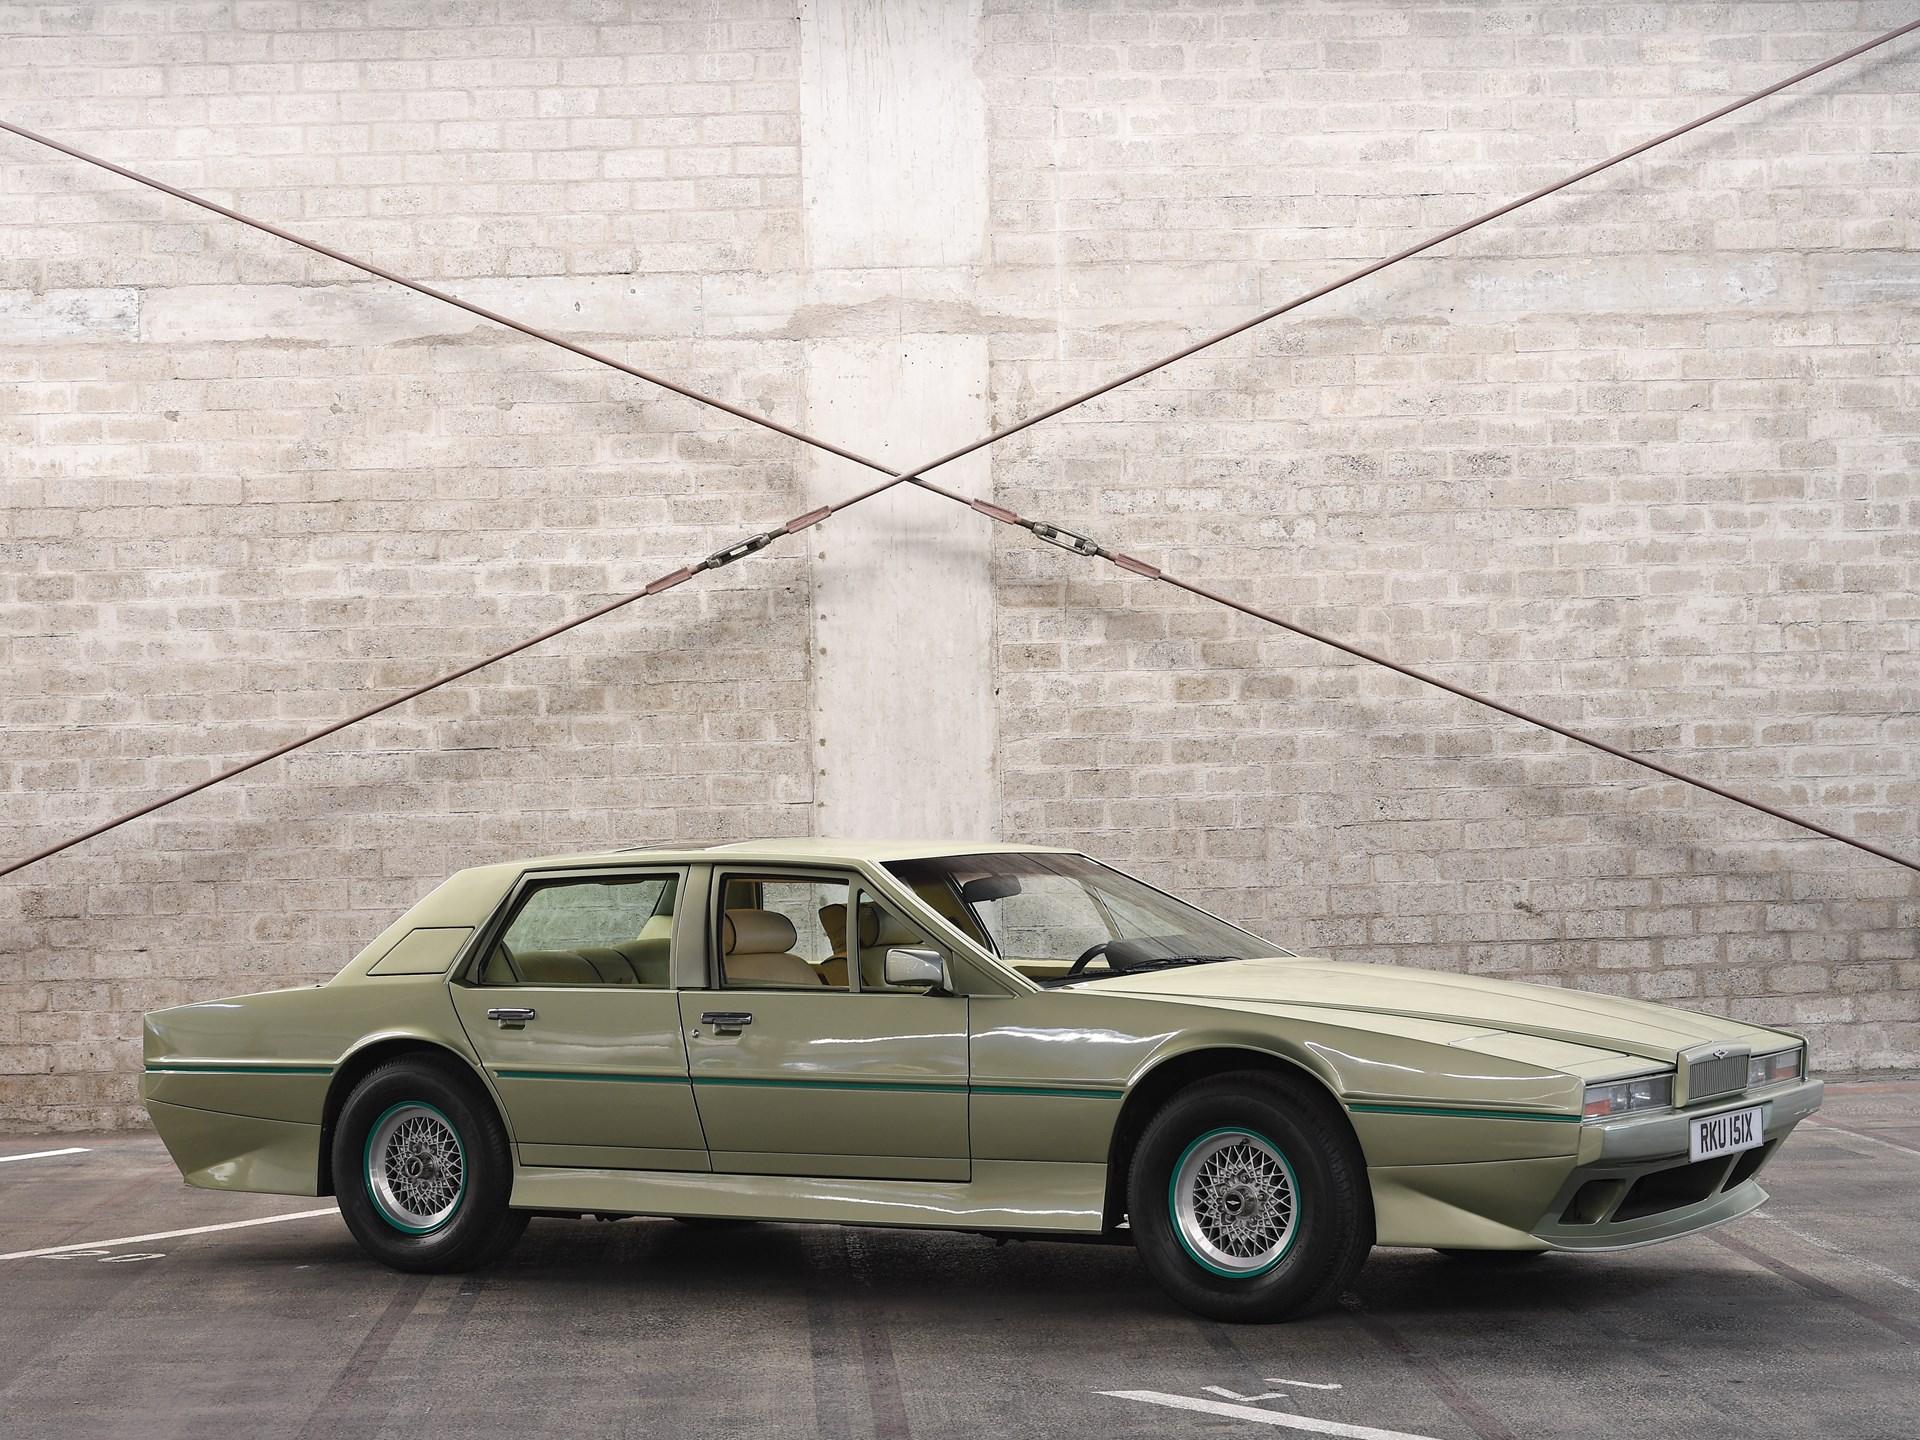 1983 Aston Martin Tickford Lagonda 3.4 front